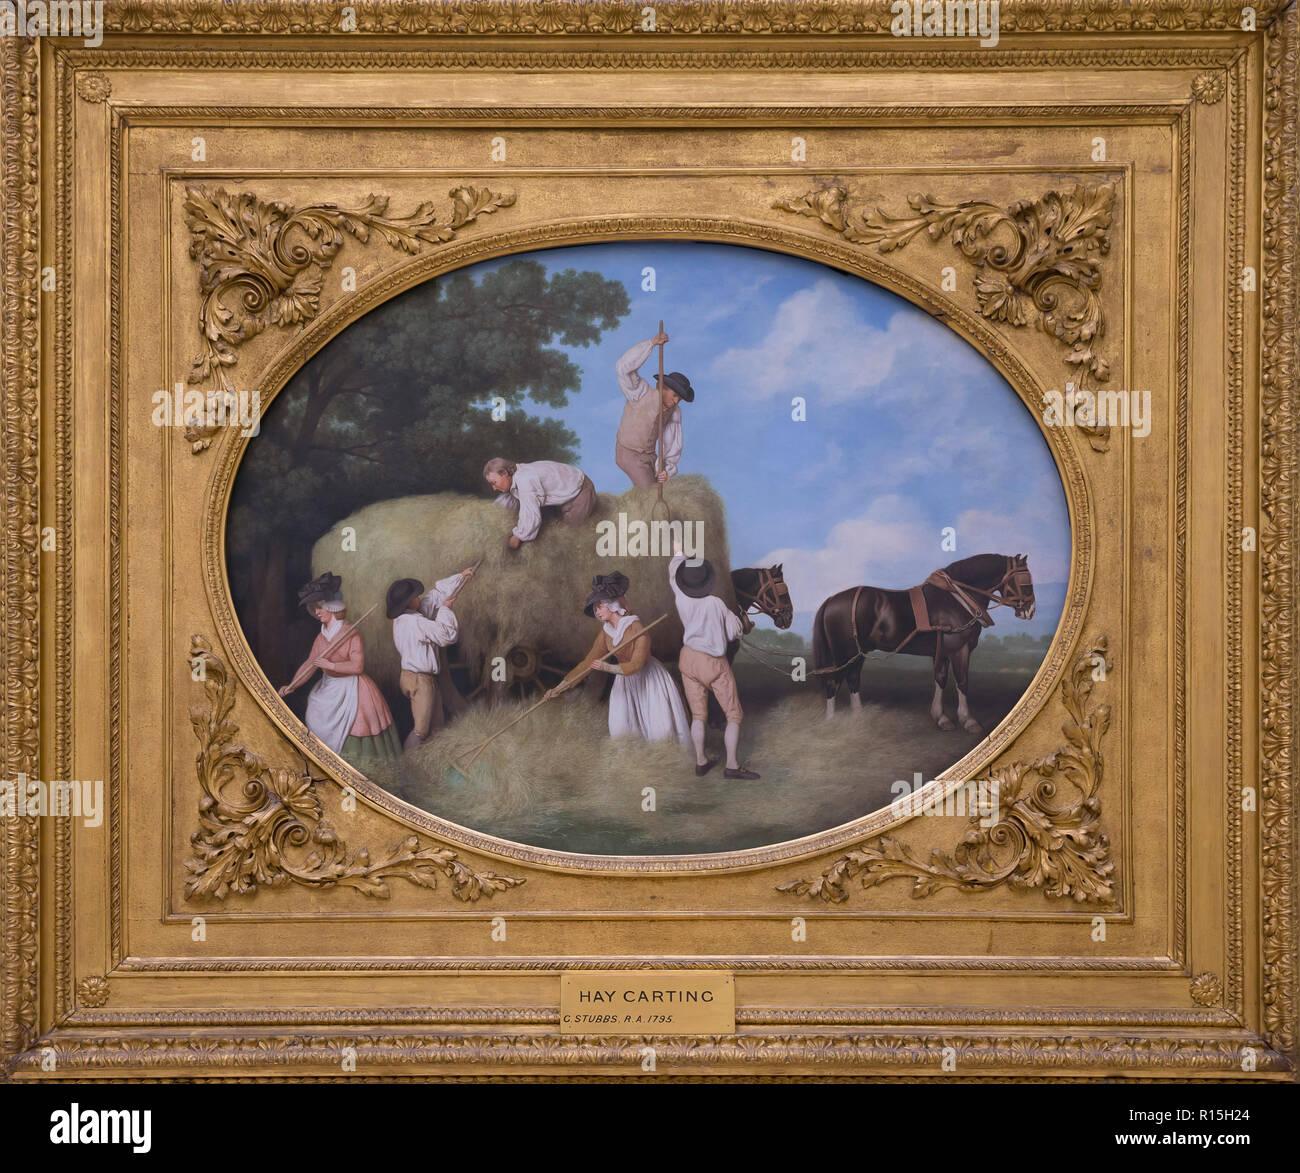 Haycarting, George Stubbs, 1795, Lady Lever Art Gallery, Port Sunlight, Liverpool, England, UK, Europe - Stock Image